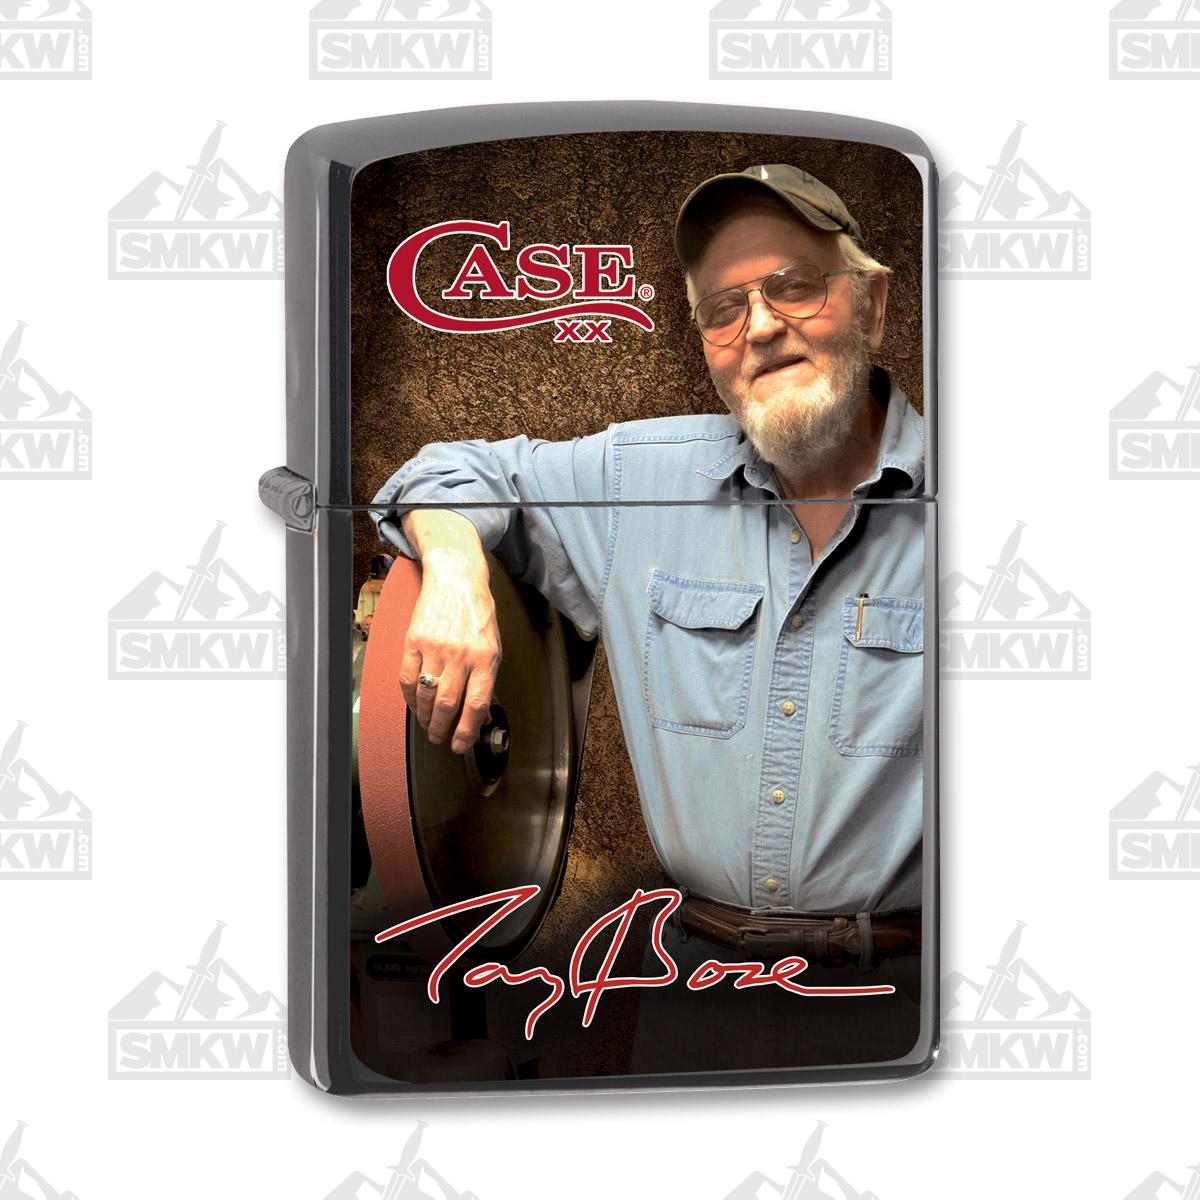 Case and Tony Bose Zippo Lighter